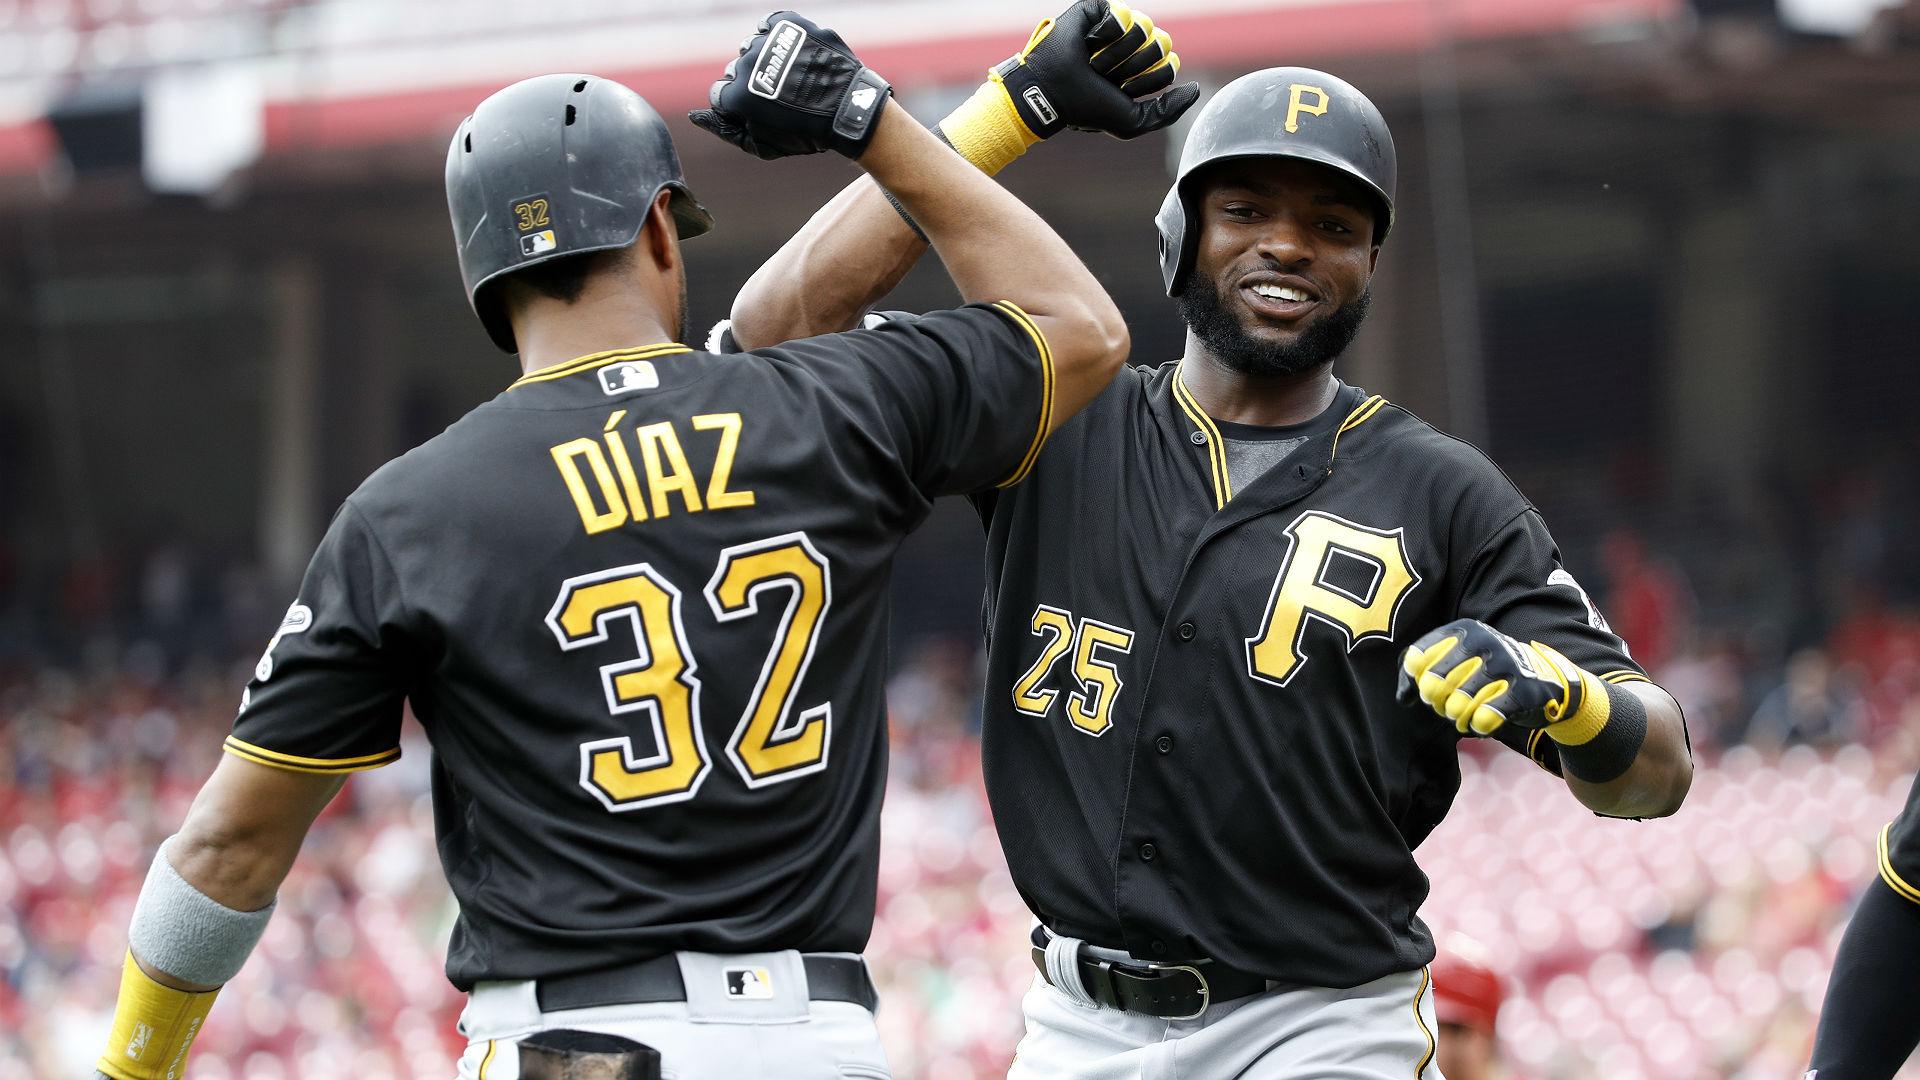 MLB wrap: Pirates top Reds, extend winning streak to 9